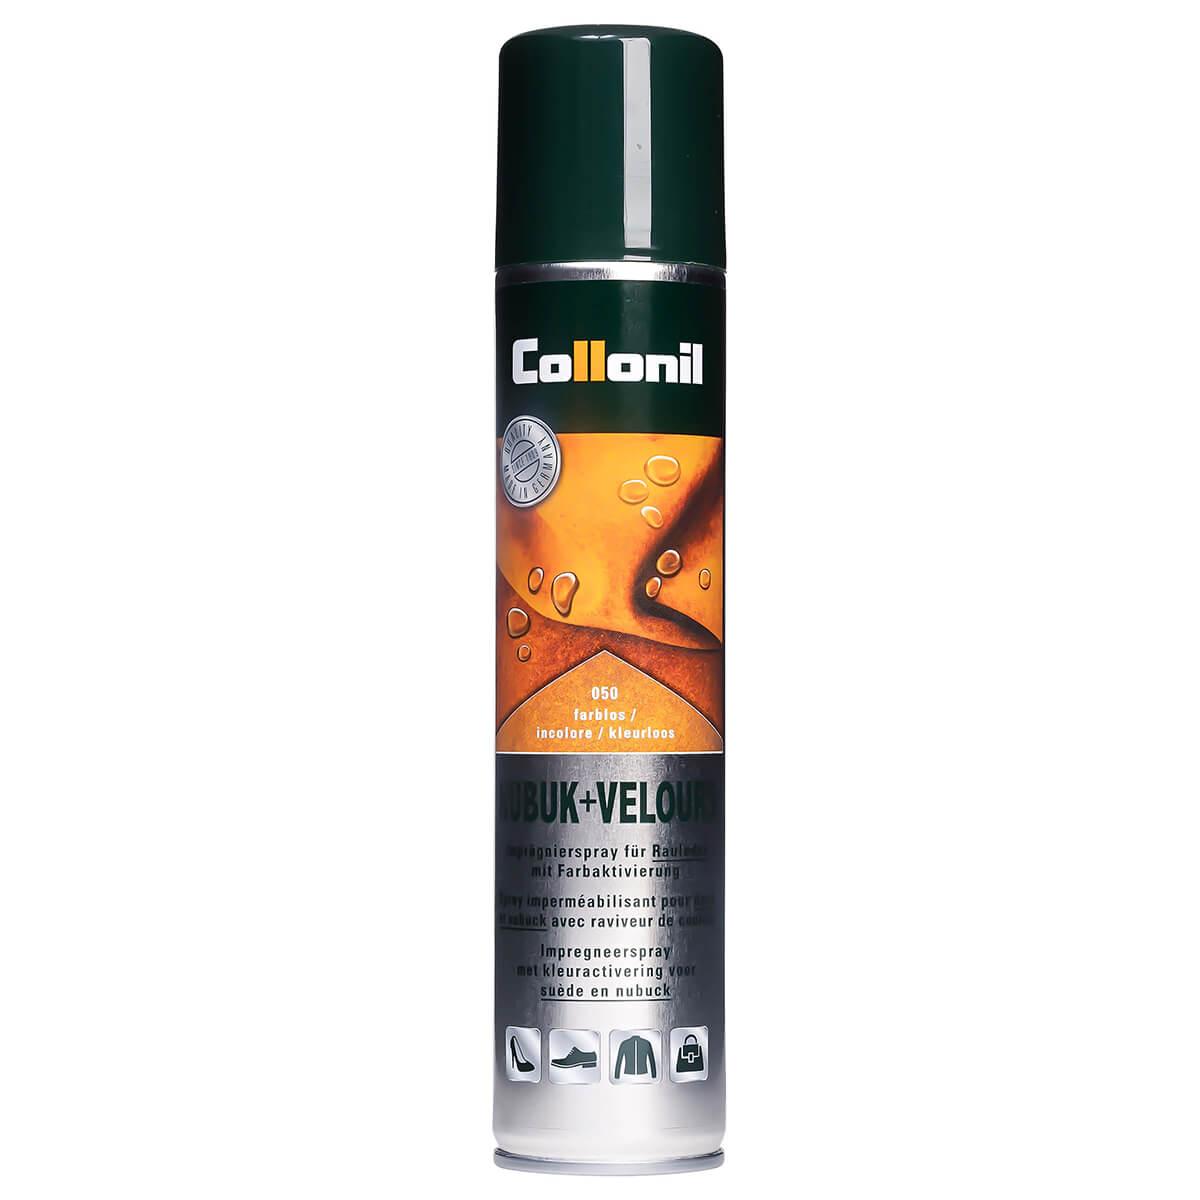 Collonil Spray NUBUK & VELOUR FARBLOS